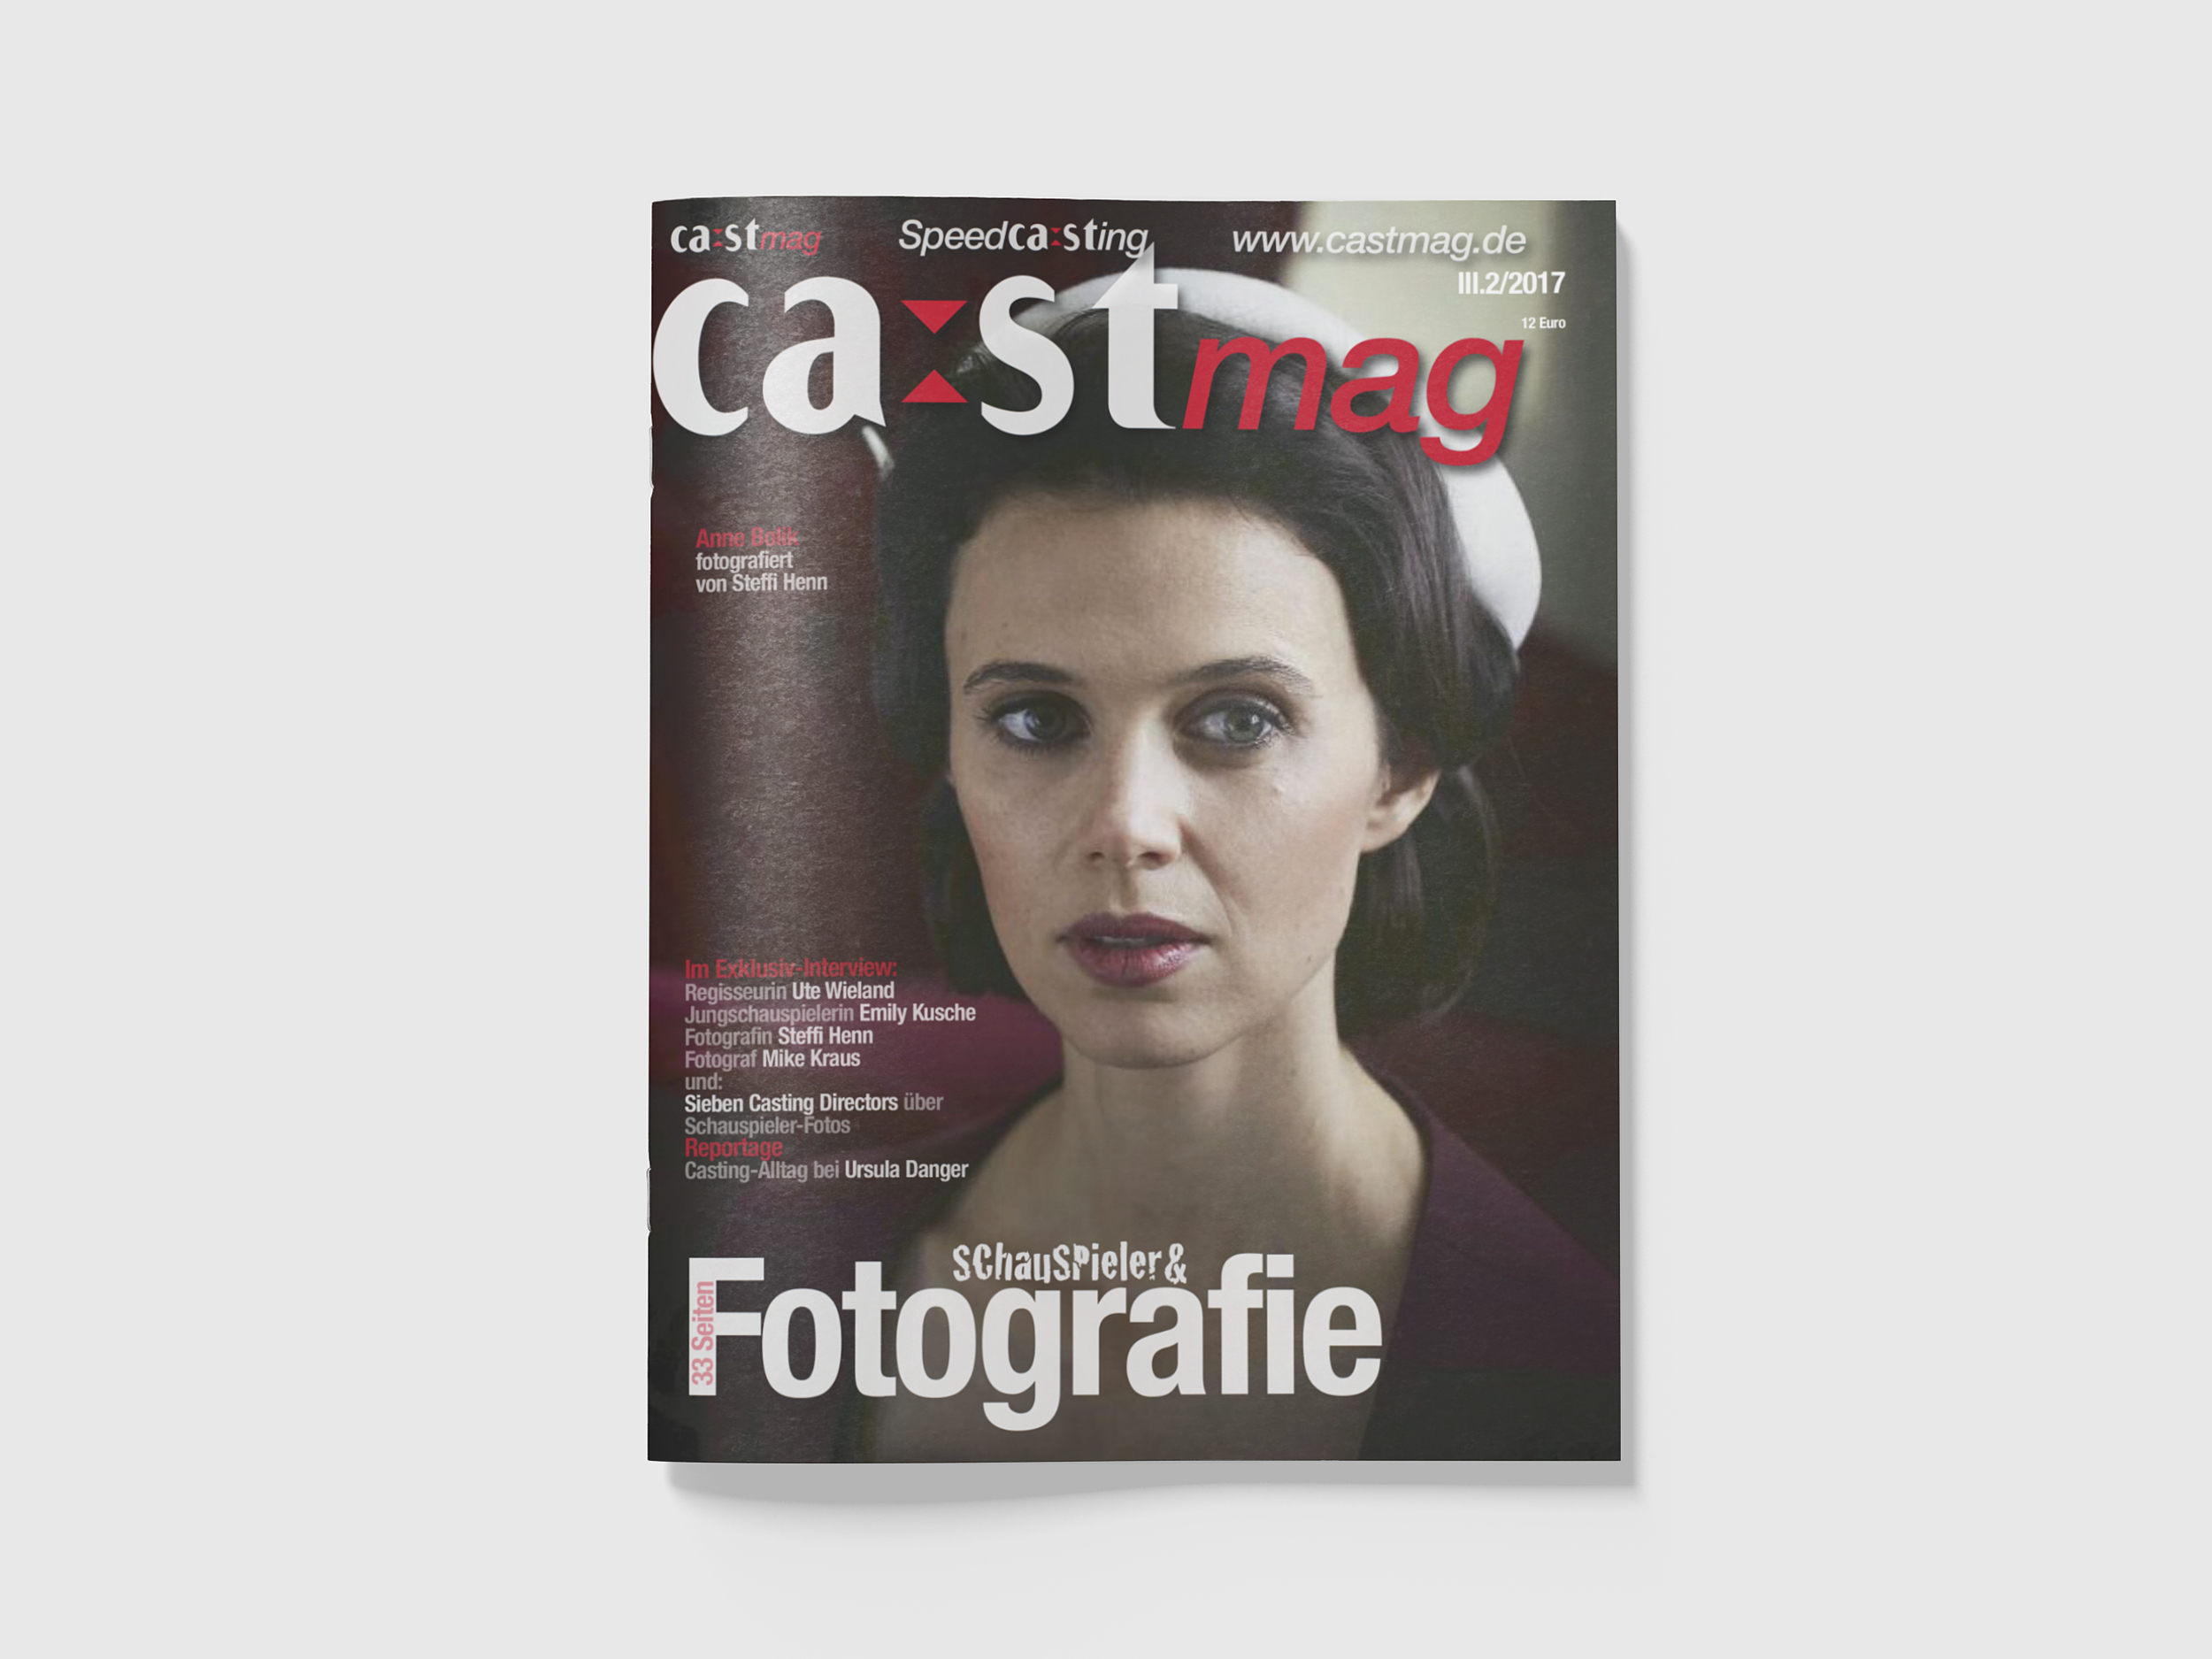 CAST-MAG_View-01_000_2500.jpg